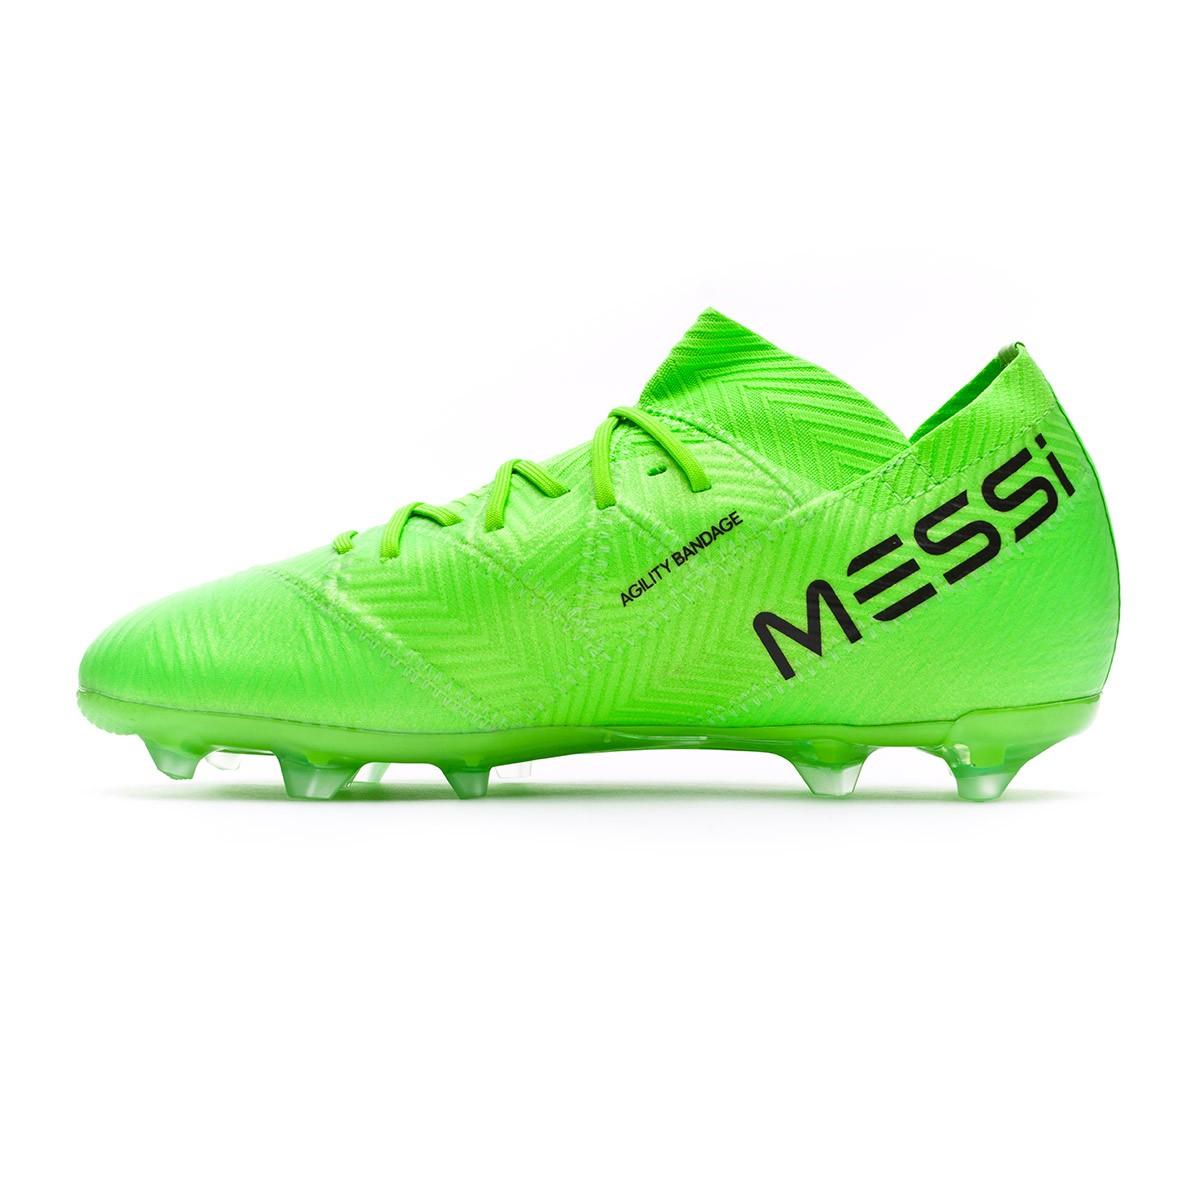 detailed look ad89a 0def5 Bota de fútbol adidas Nemeziz Messi 18.1 FG Niño Solar green-Black - Leaked  soccer